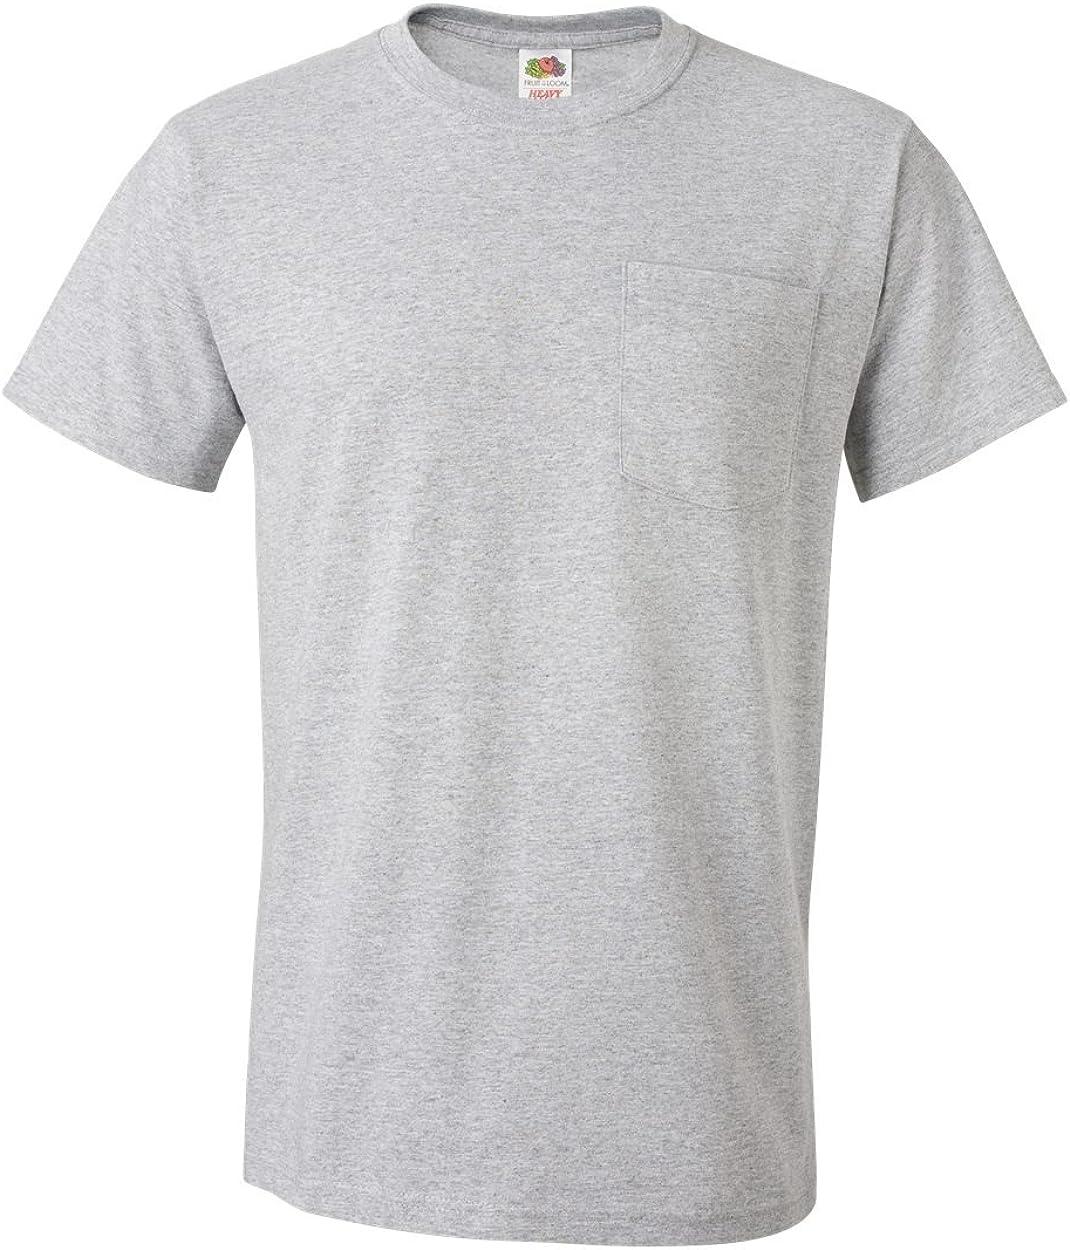 Fruit of the Loom Mens Super Premium Short Sleeve T-Shirt Pack of 5